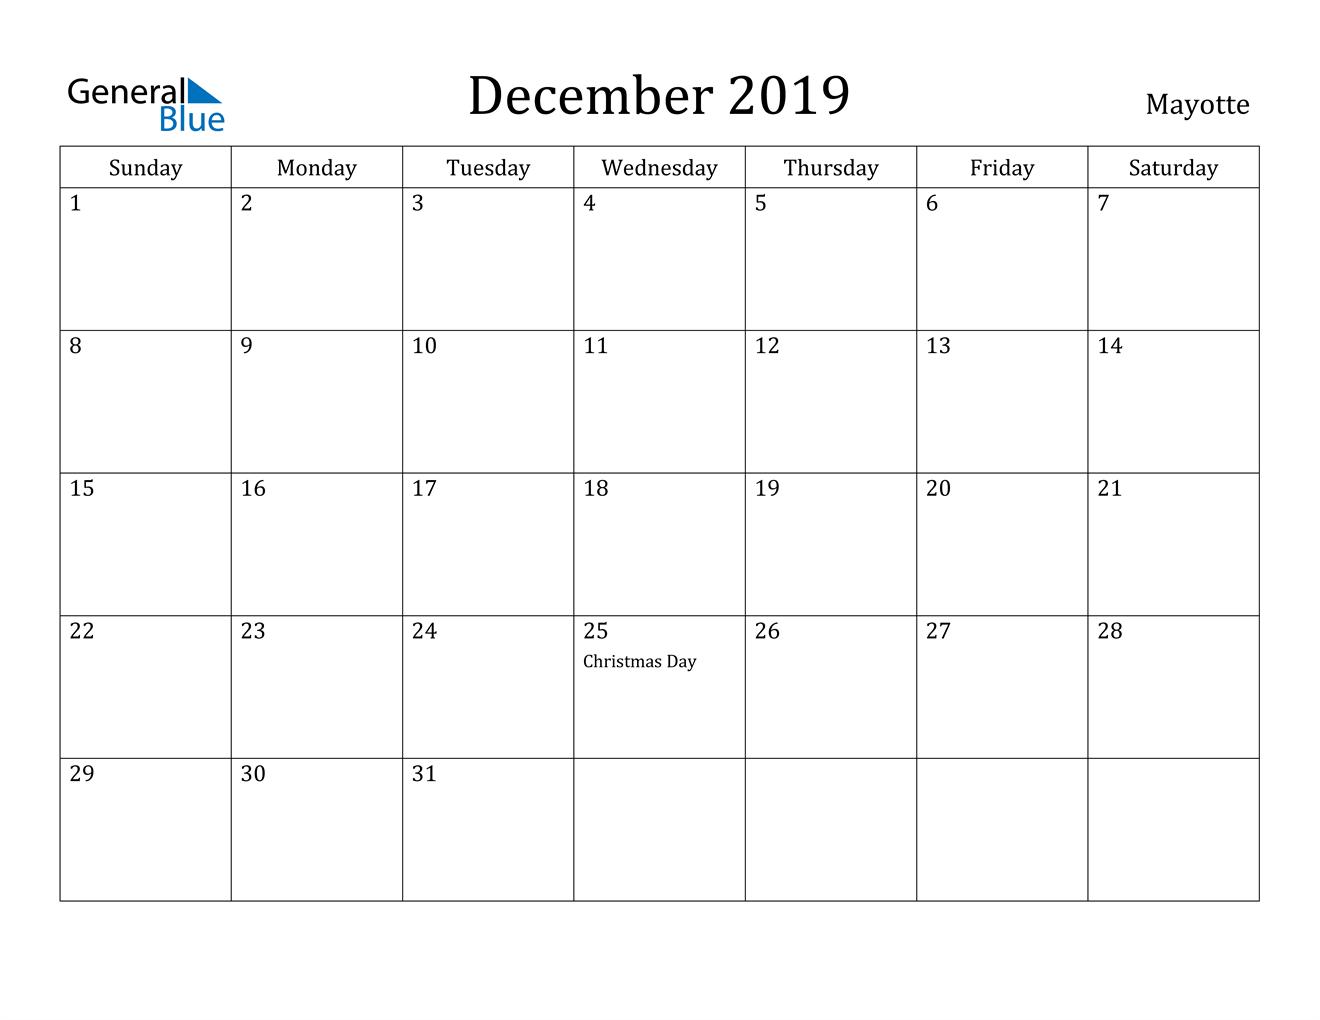 Image of December 2019 Mayotte Calendar with Holidays Calendar